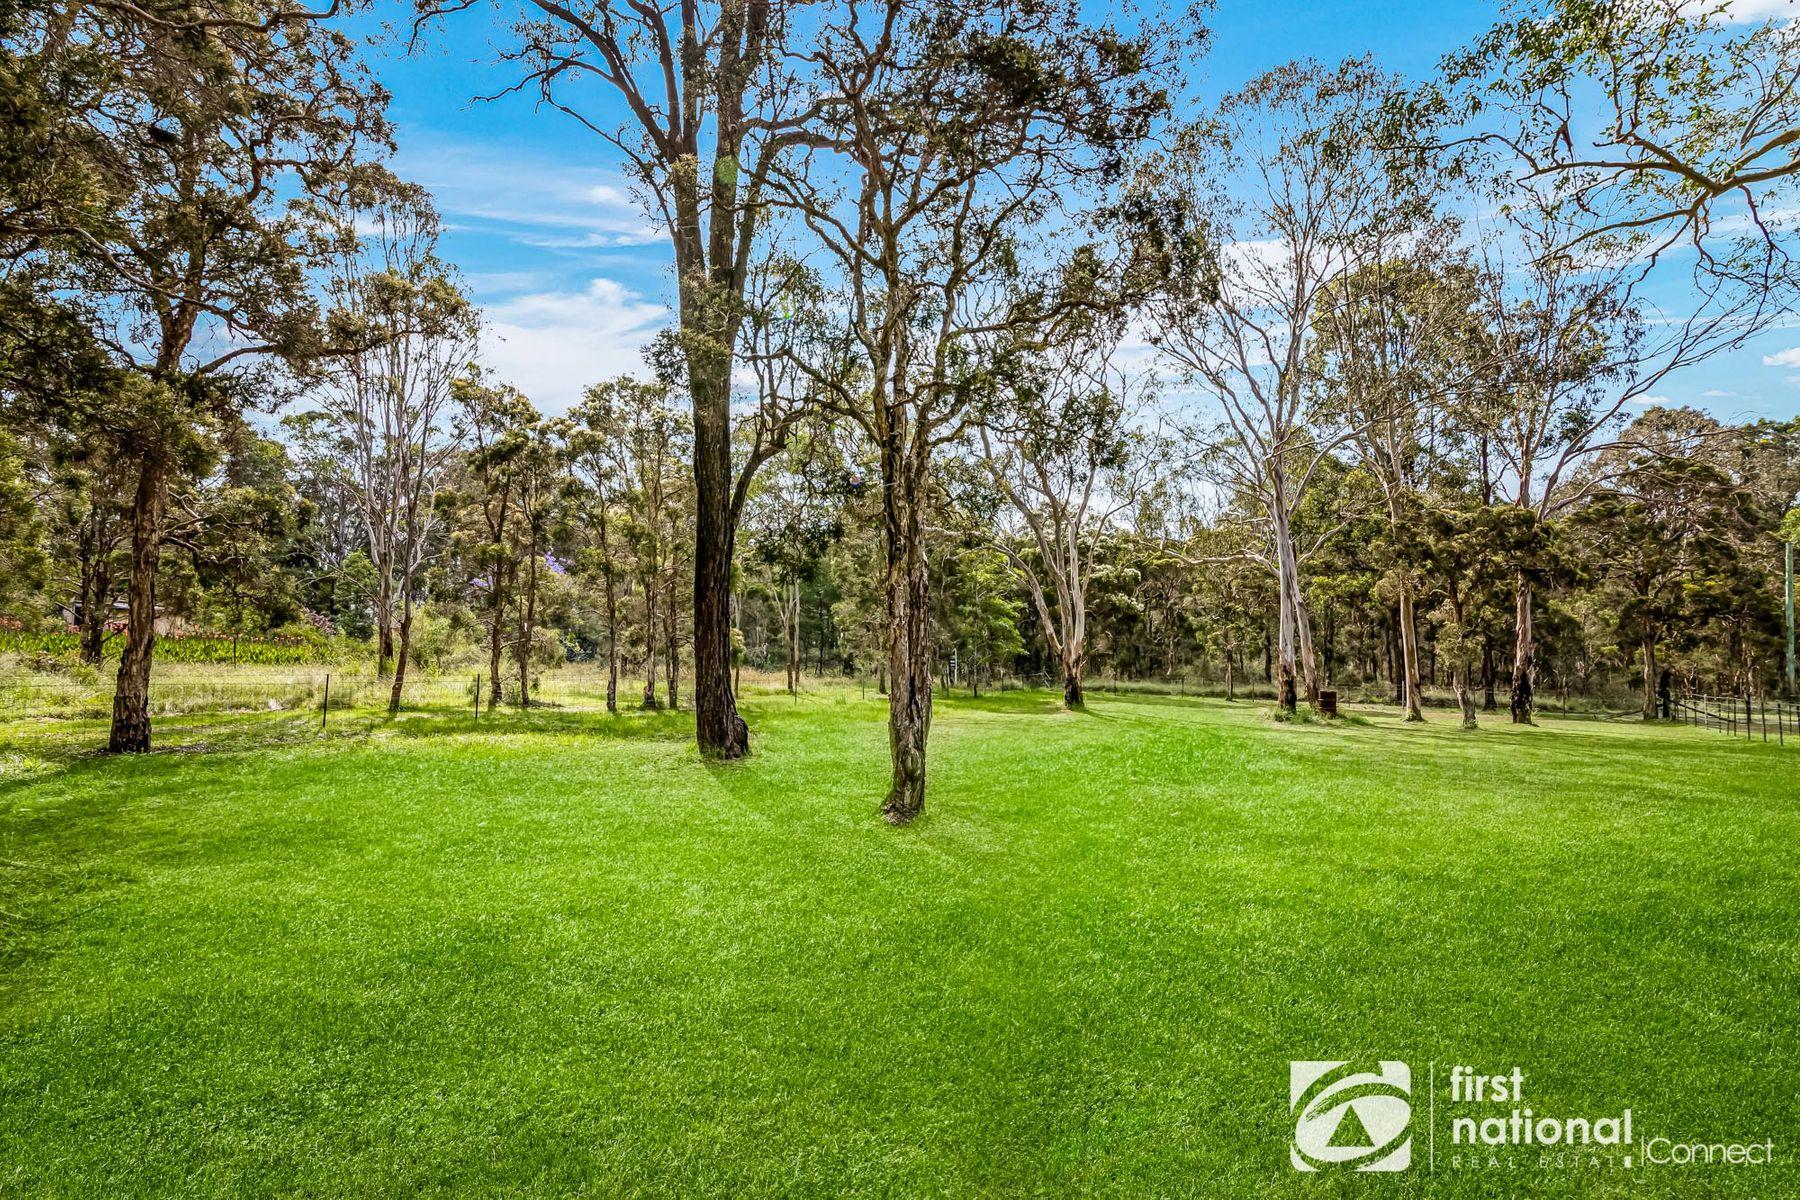 LOT 6,7 & 8 Ashford Rd, Vineyard, NSW 2765